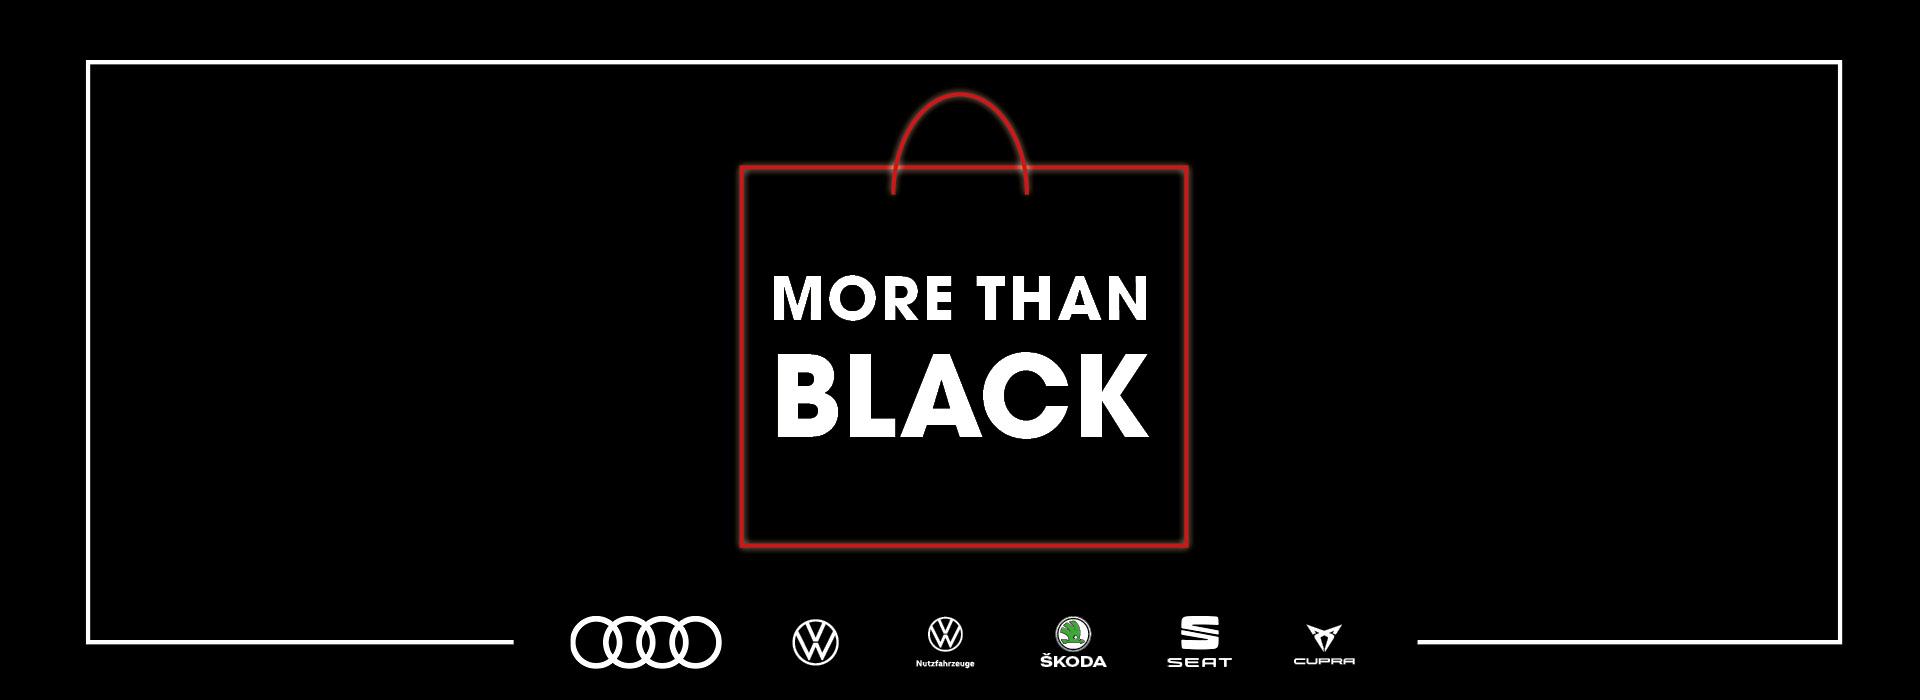 MORE THAN BLACK